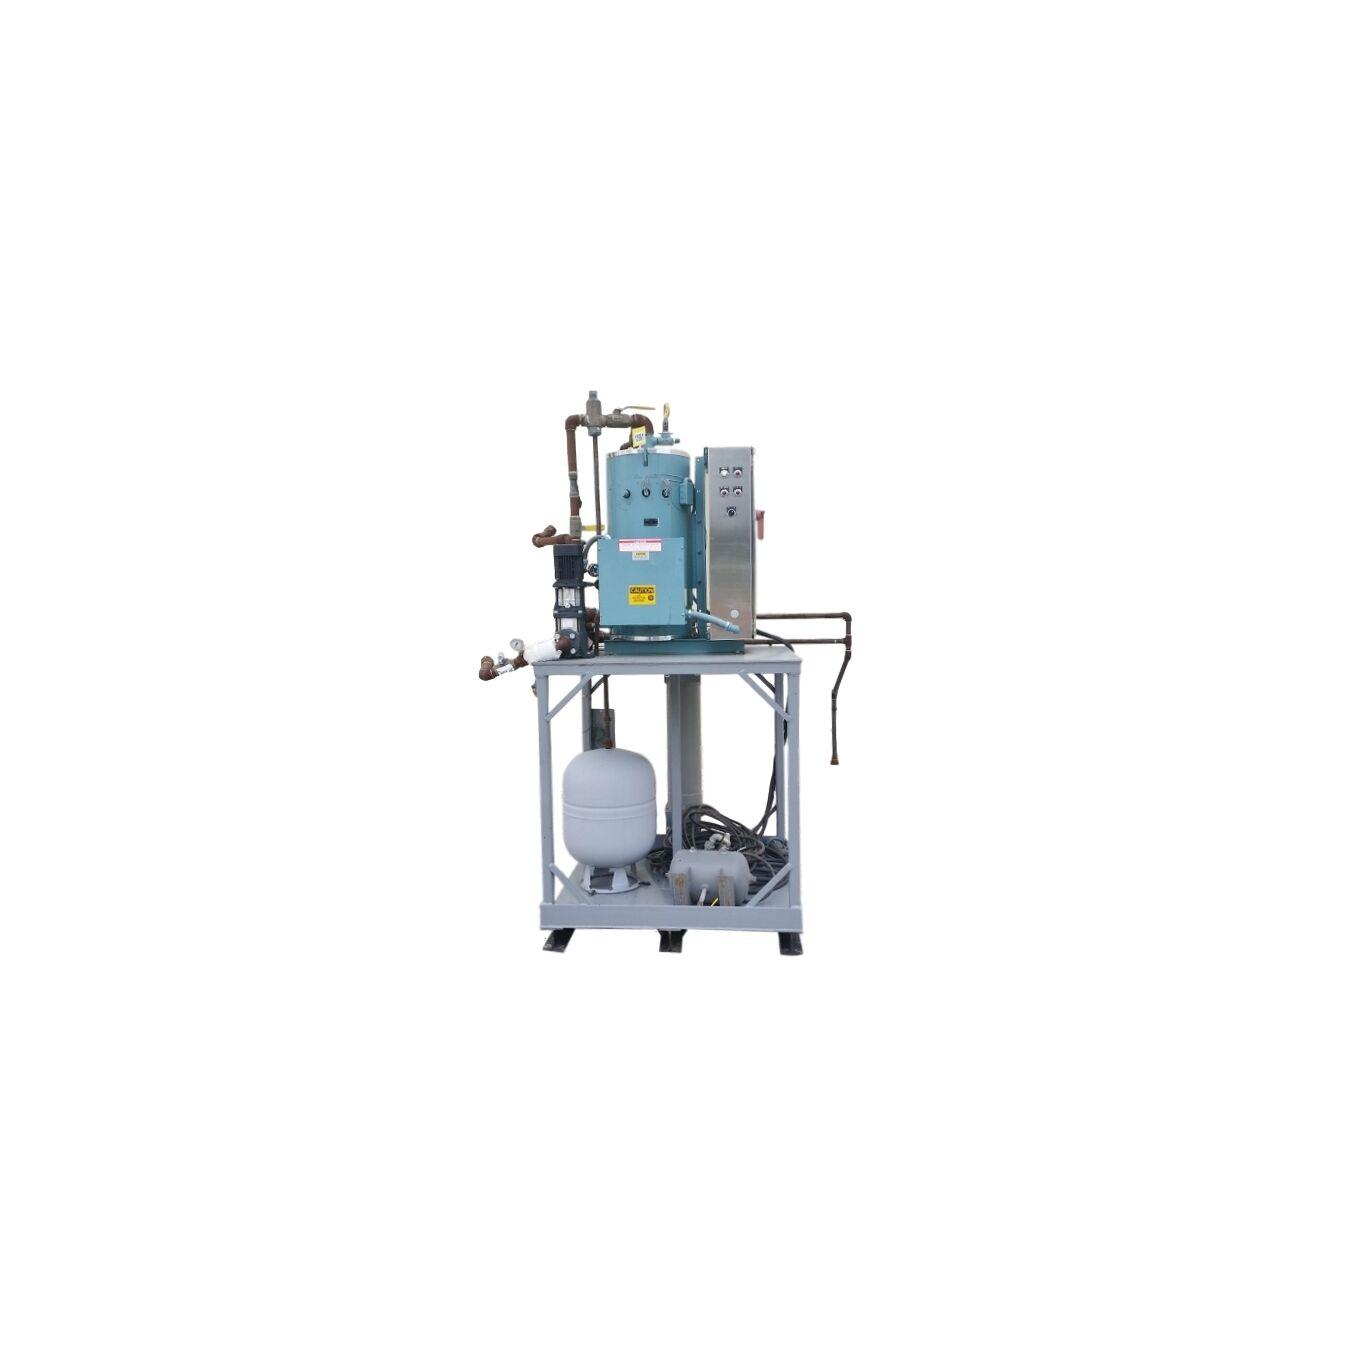 Water Boiler Model ~ Used cleaver‐brooks model wb‐ ‐ kw‐ hw electric hot